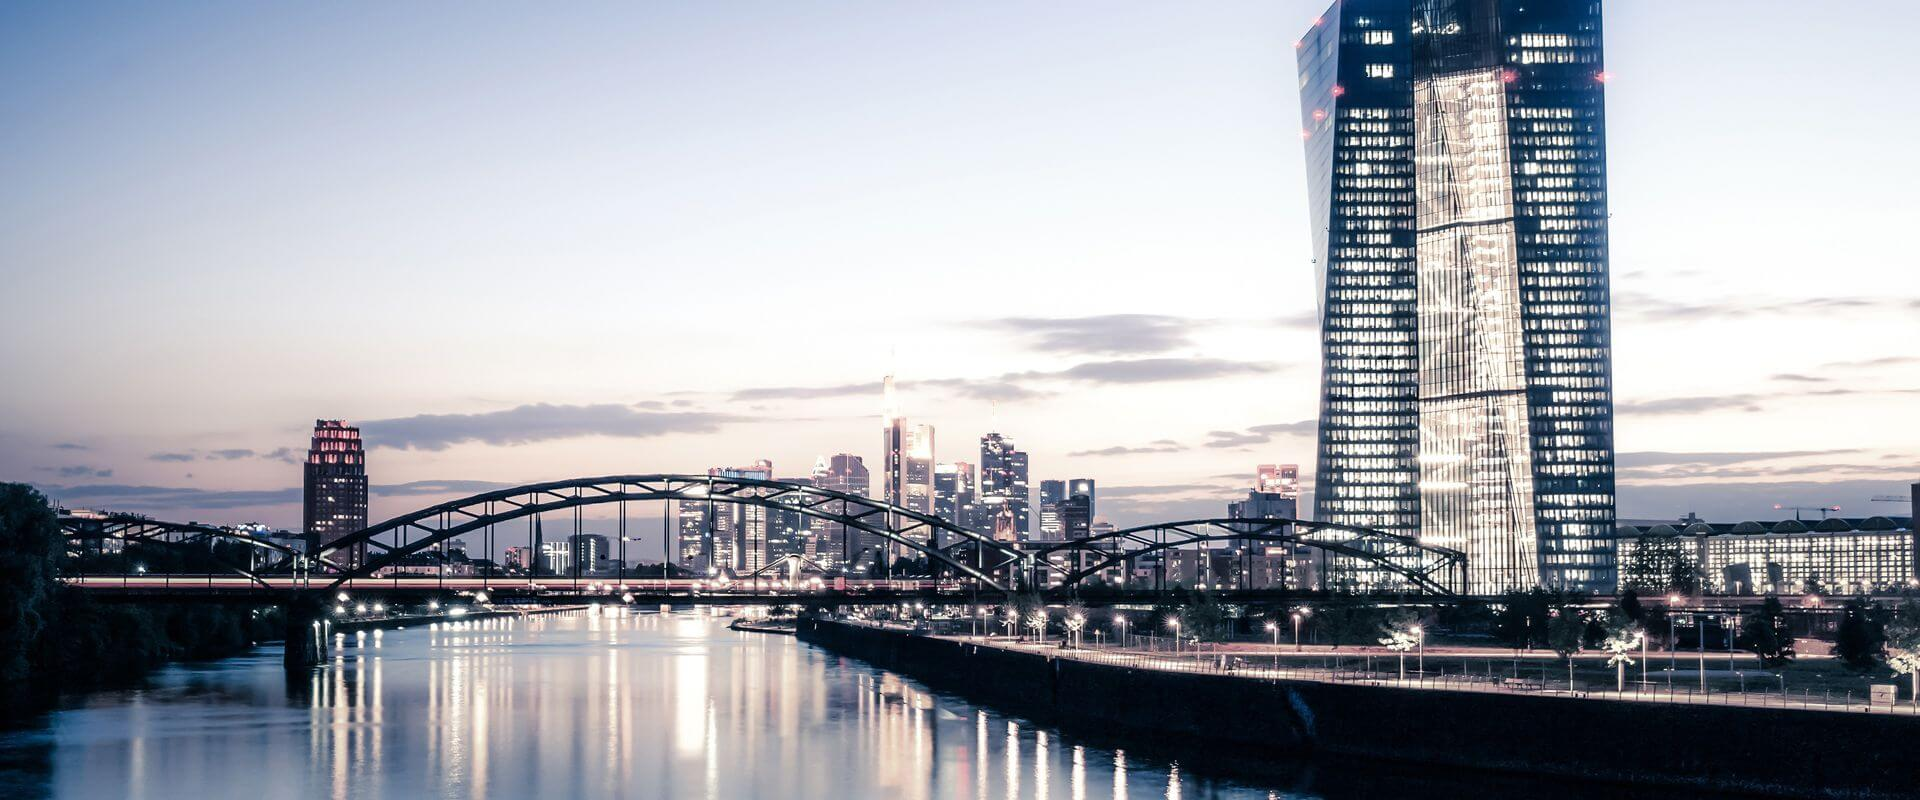 bee-smart-city-skyline-bridge-by-night.jpg